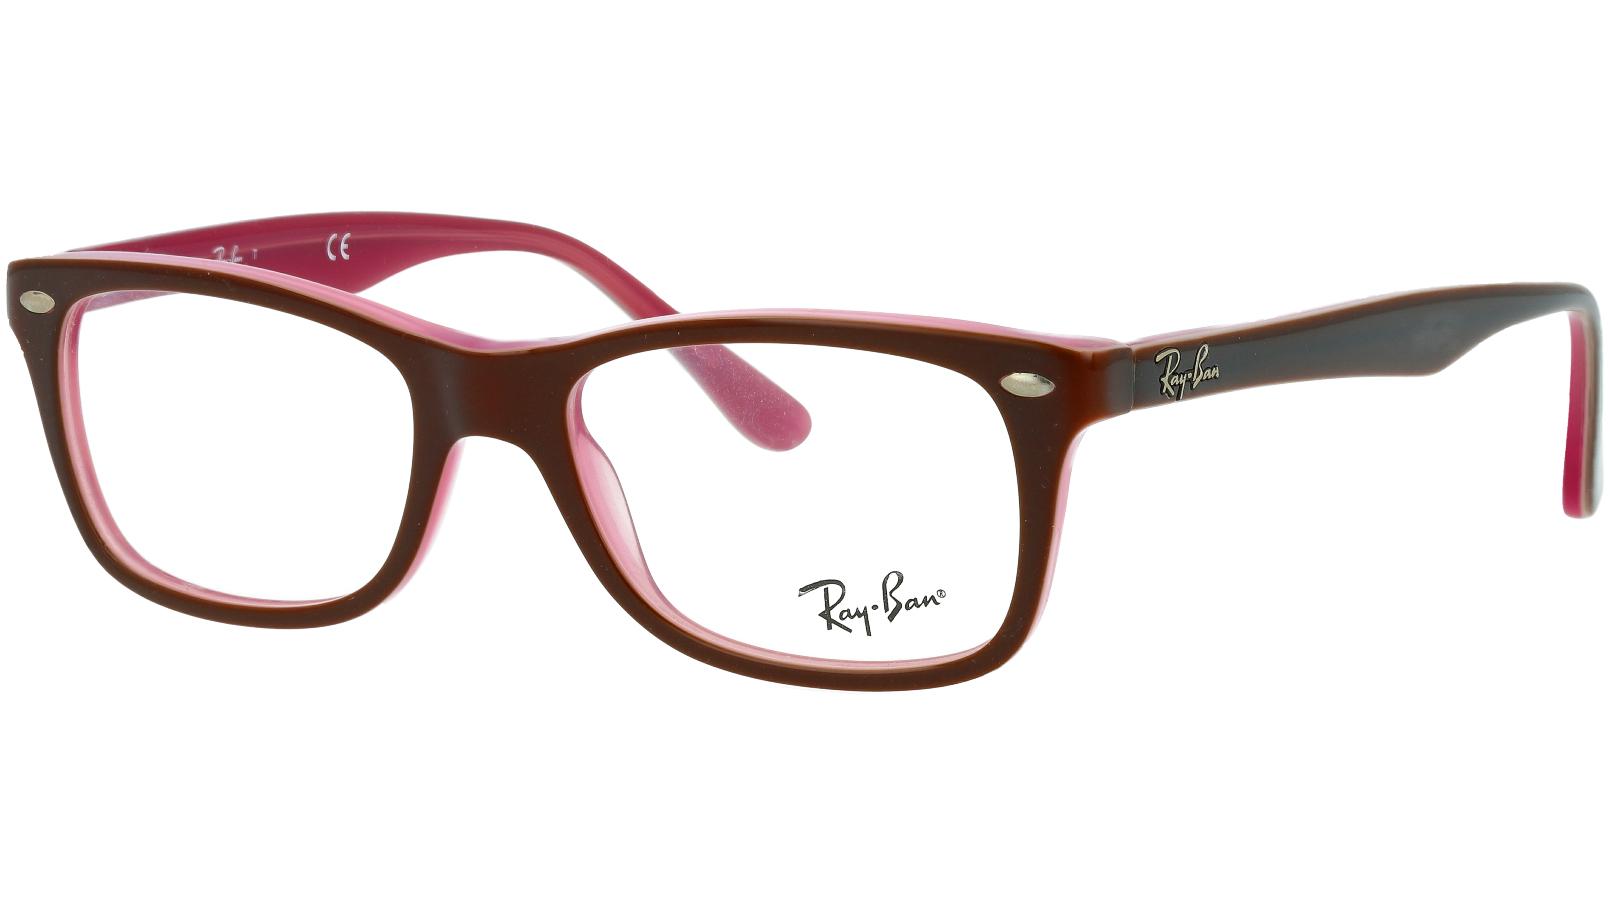 Ray-Ban RB5228 2126 50 VIOLET Glasses